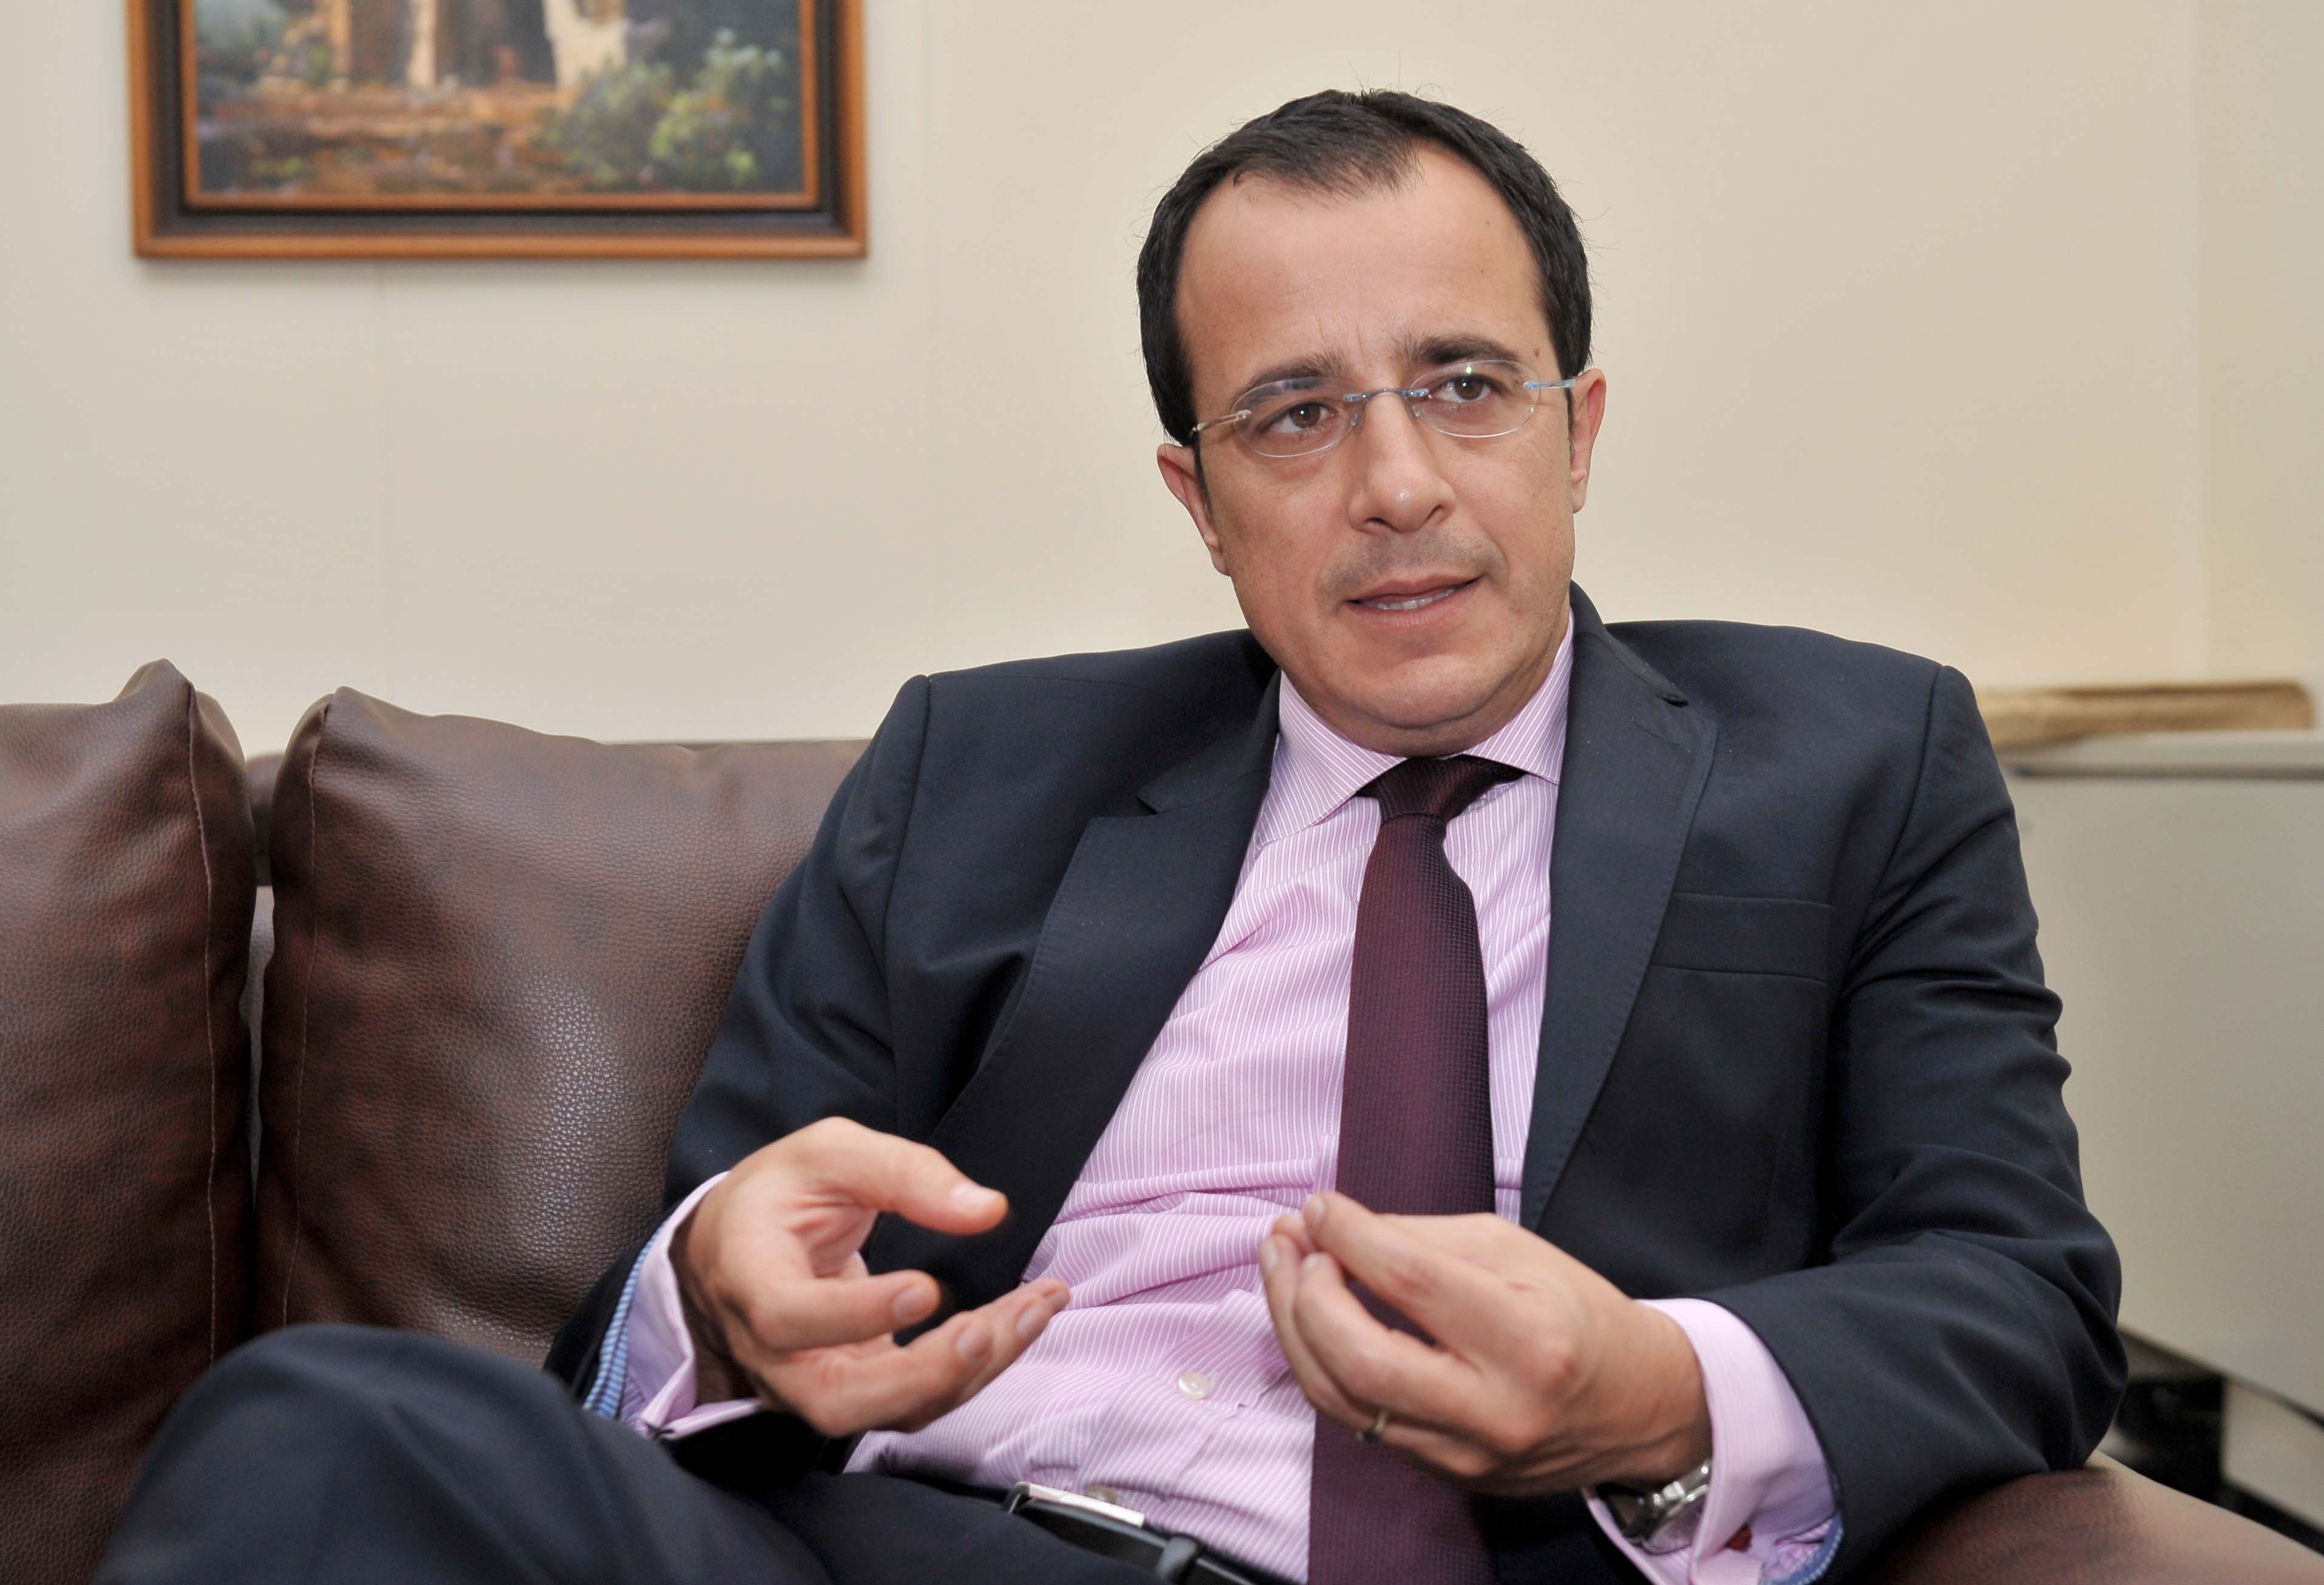 Cypriot leaders attempt common understandings